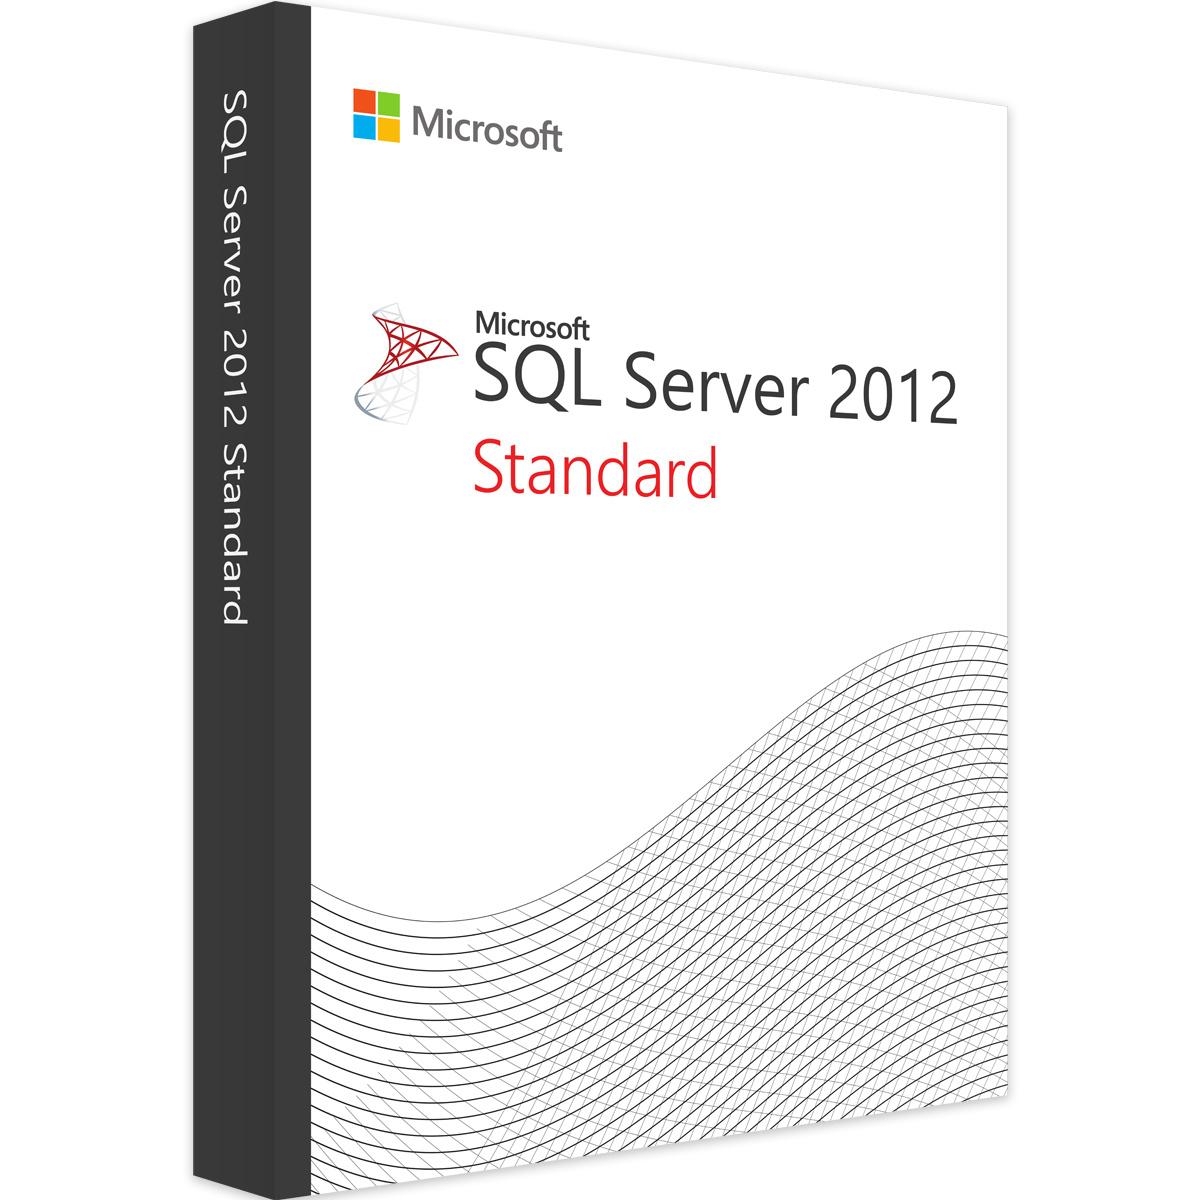 Microsoft SQL Server 2012 Standard - Microsoft Open License